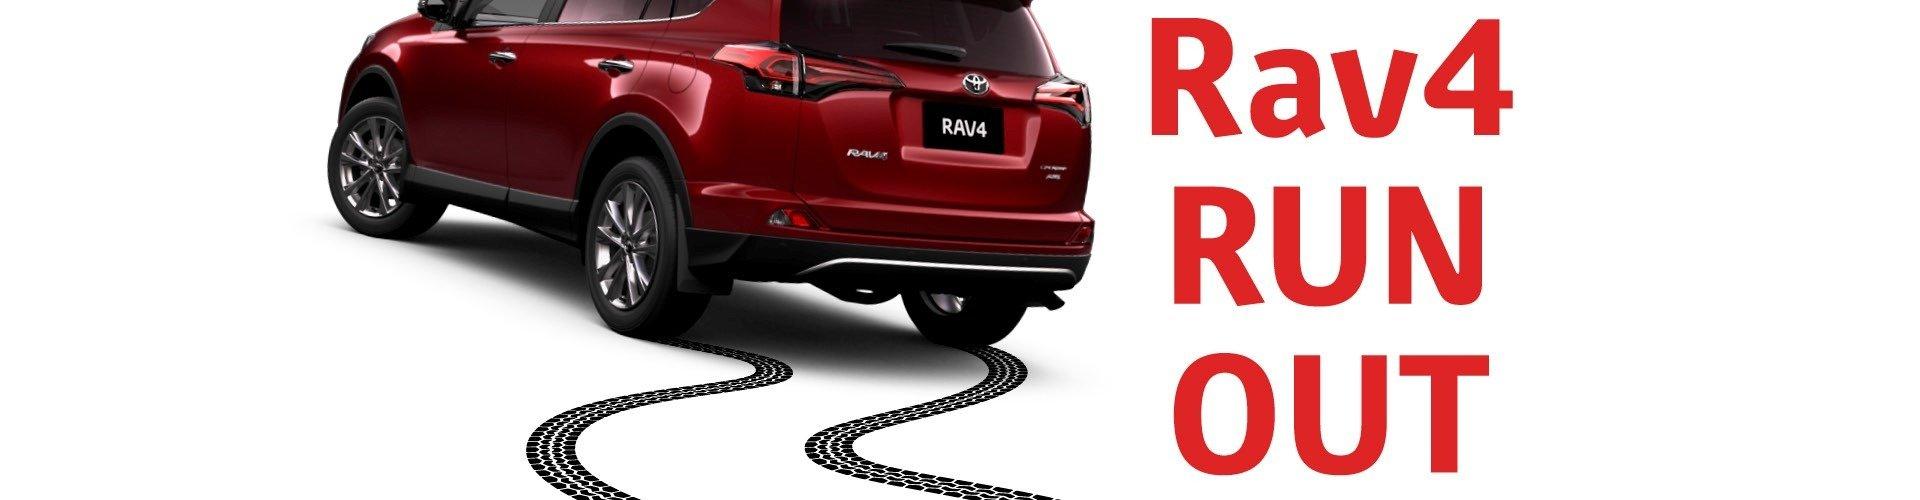 Waverley Toyota's Rav4 RUN OUT